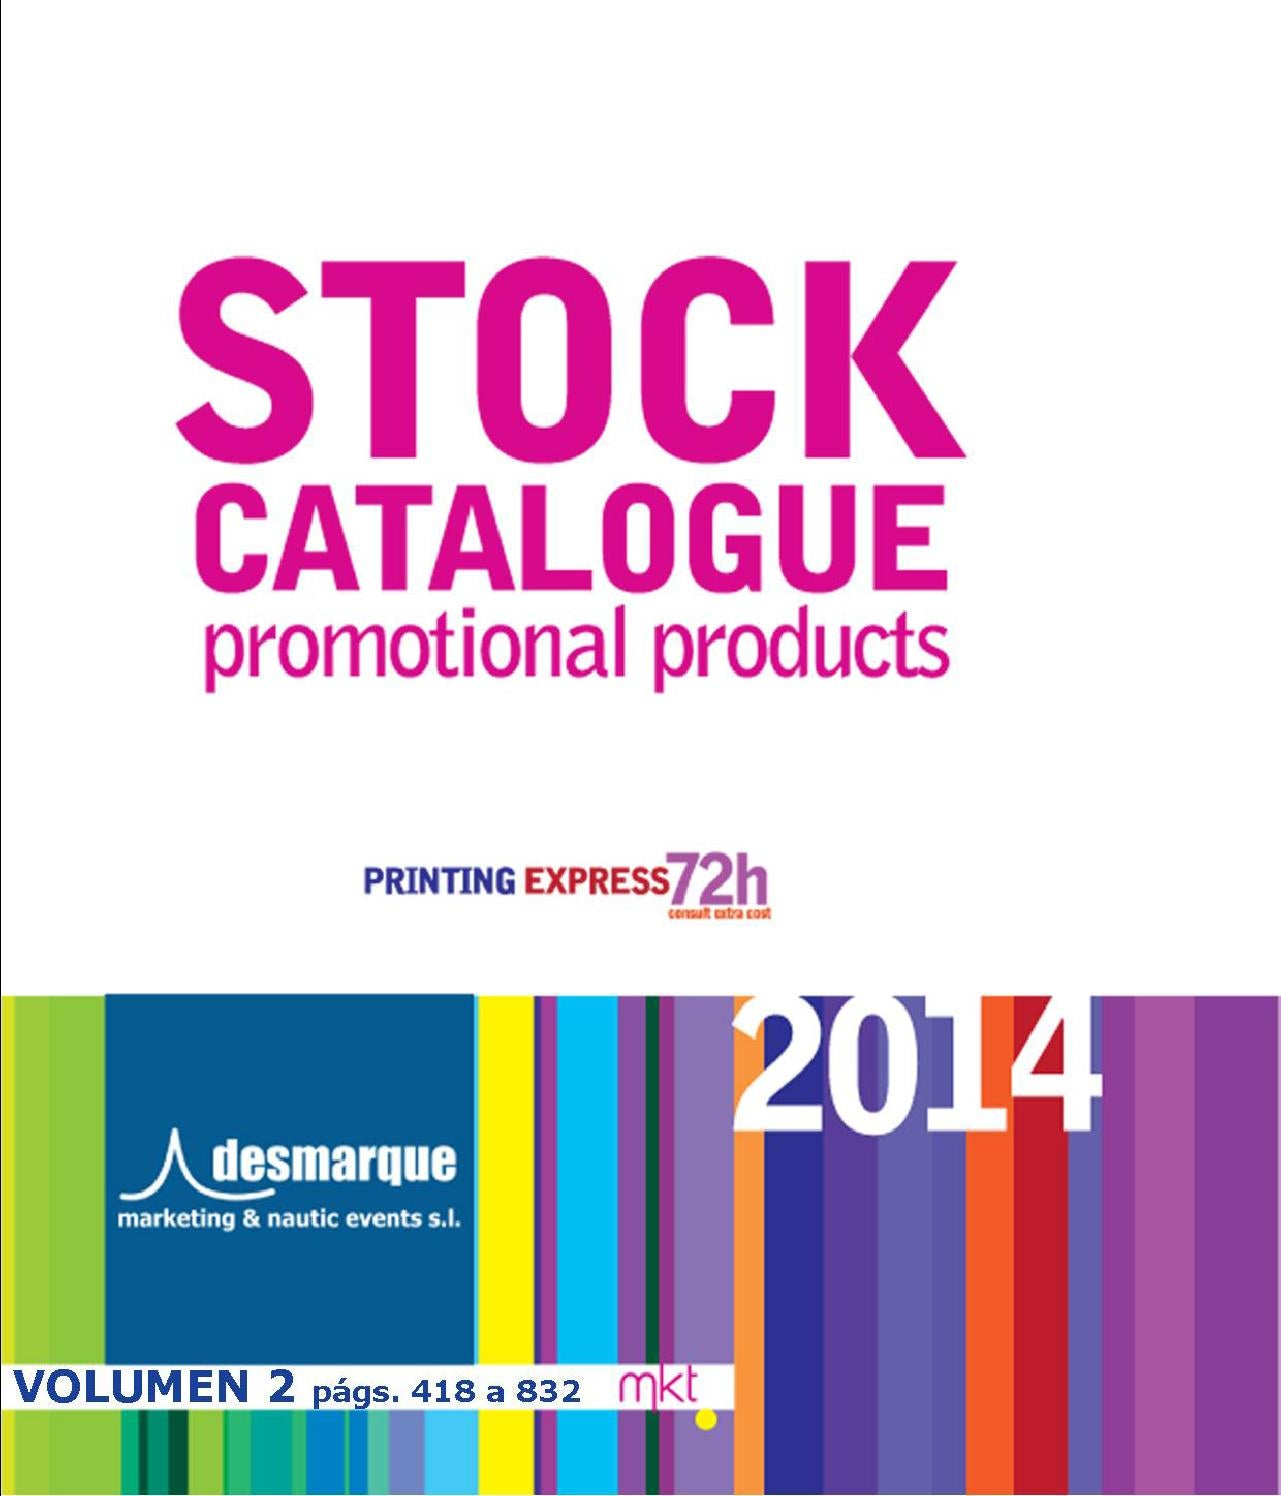 c61bac694 Makito catalogue Desmarque 2014 volumen 2 by desmarque - issuu